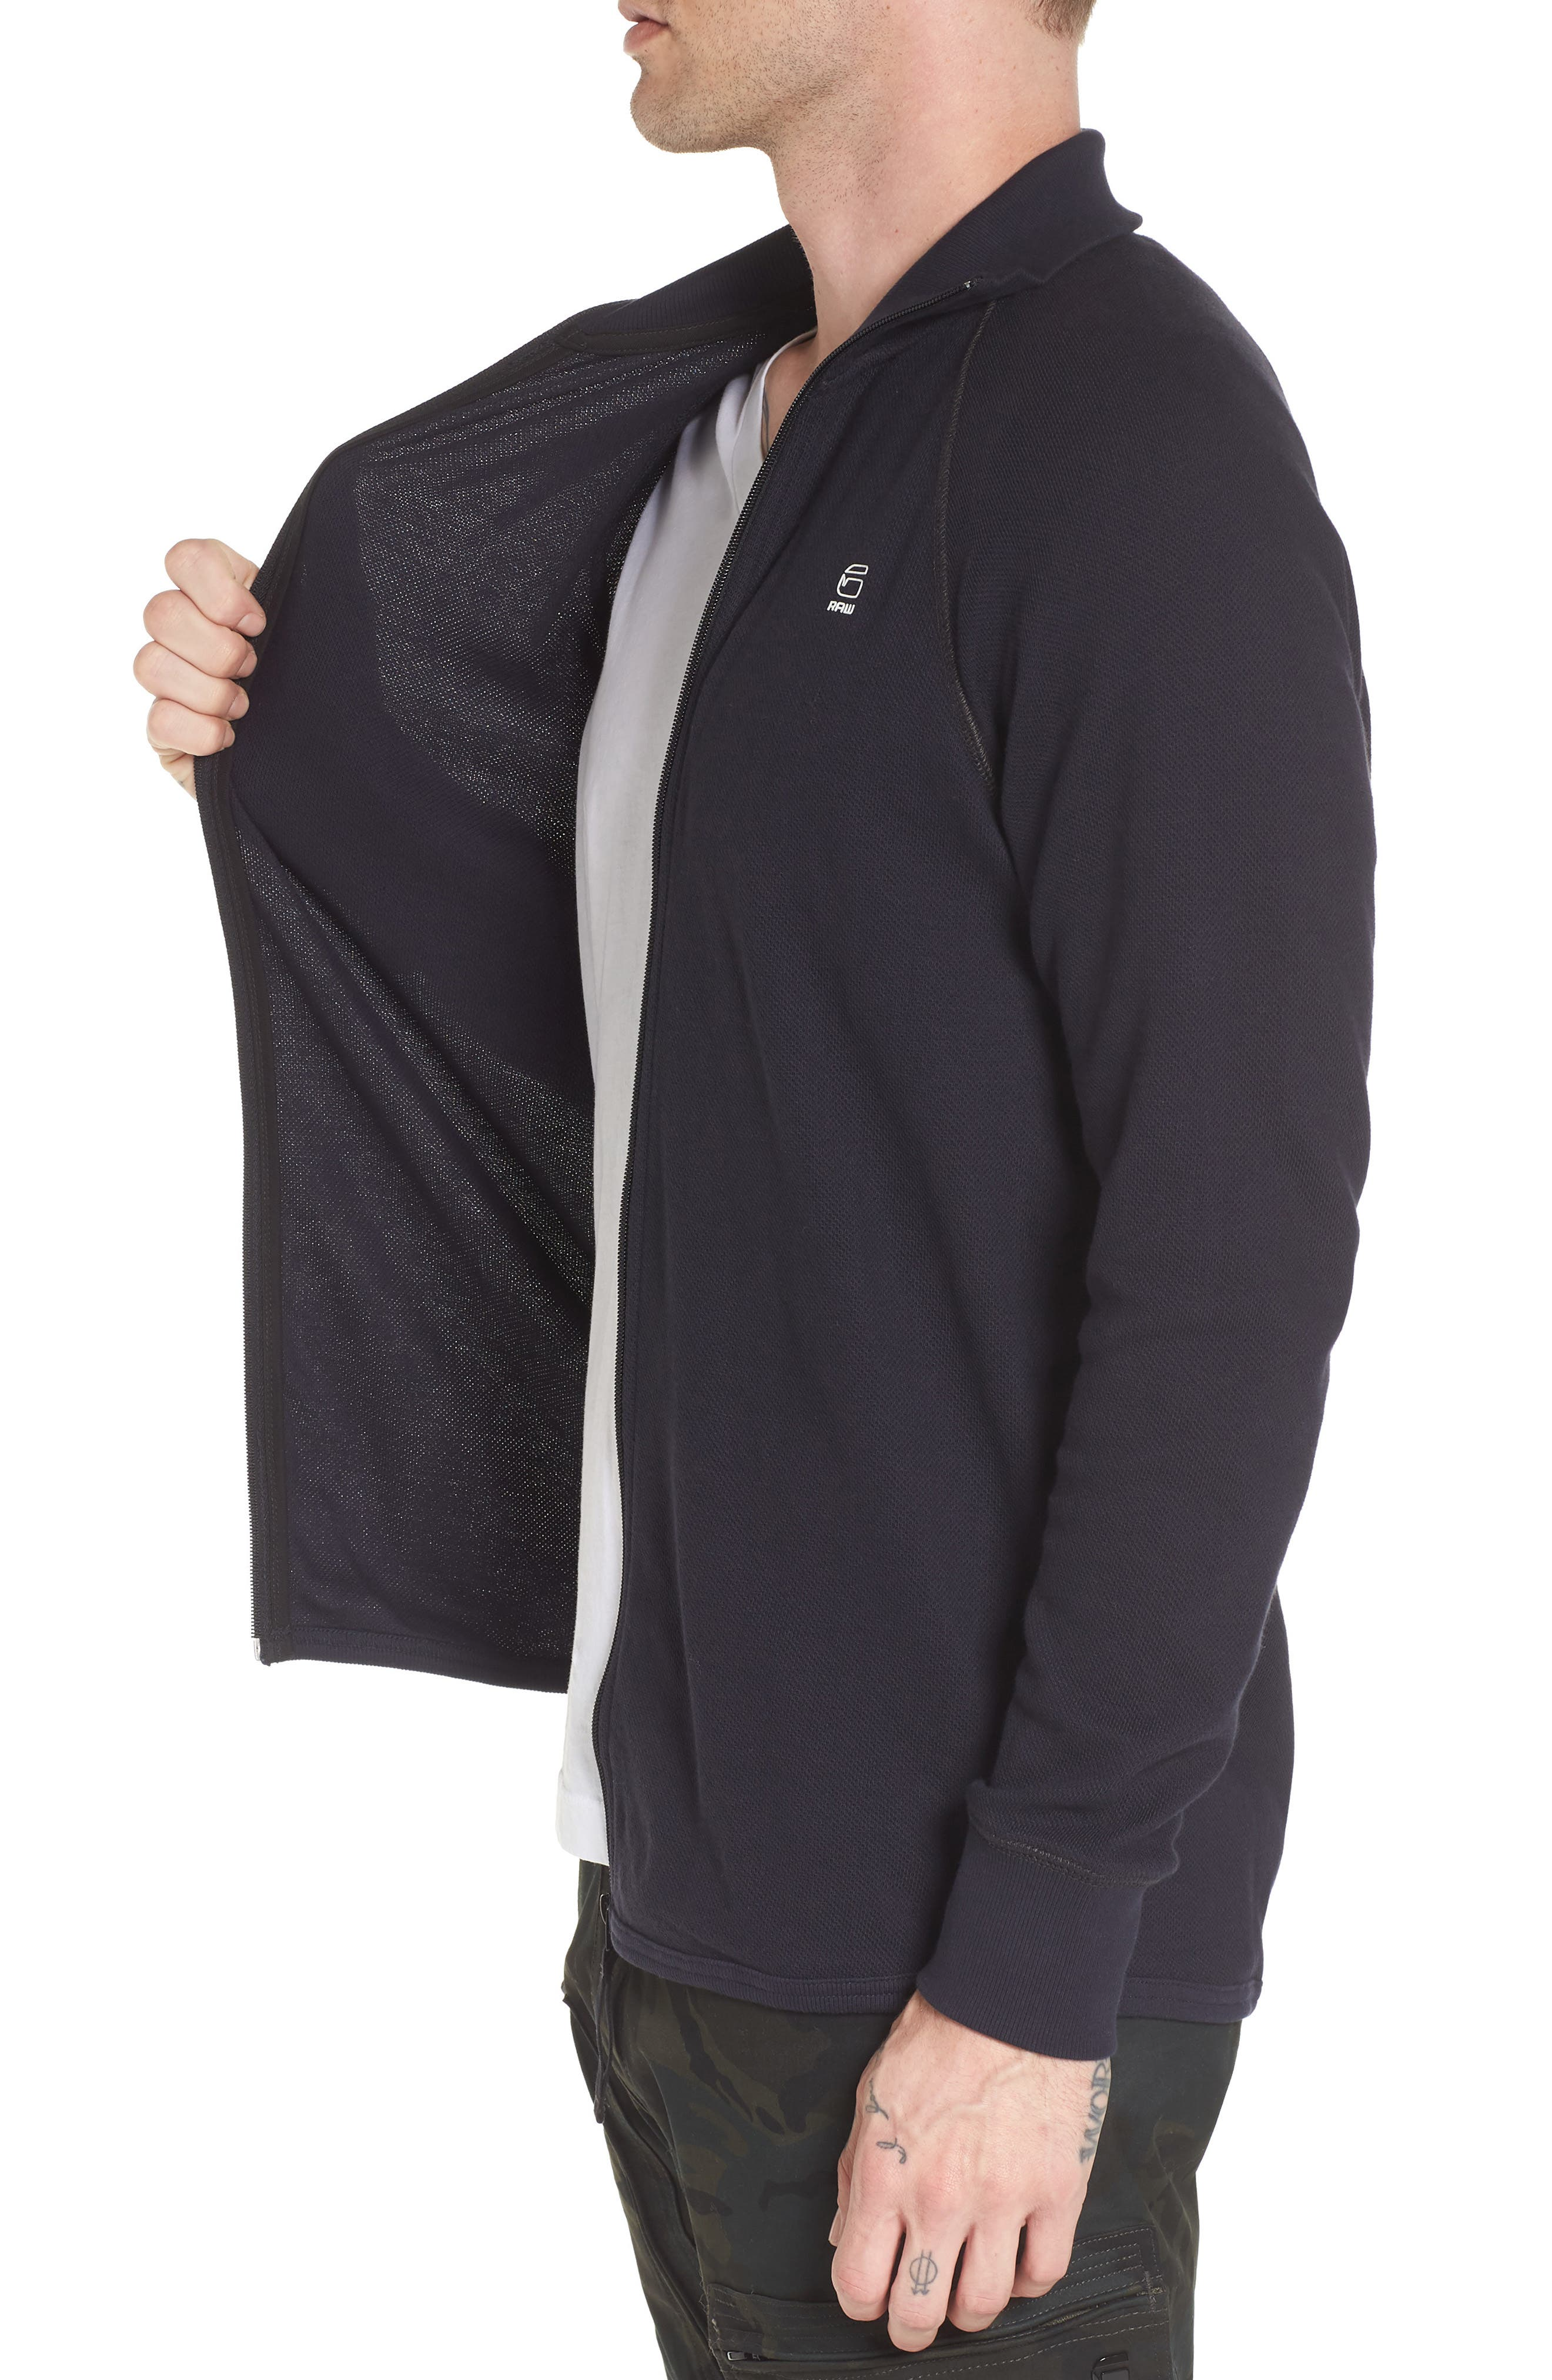 Jirgi Front Zip Sweater,                             Alternate thumbnail 3, color,                             Dark Naval Blue